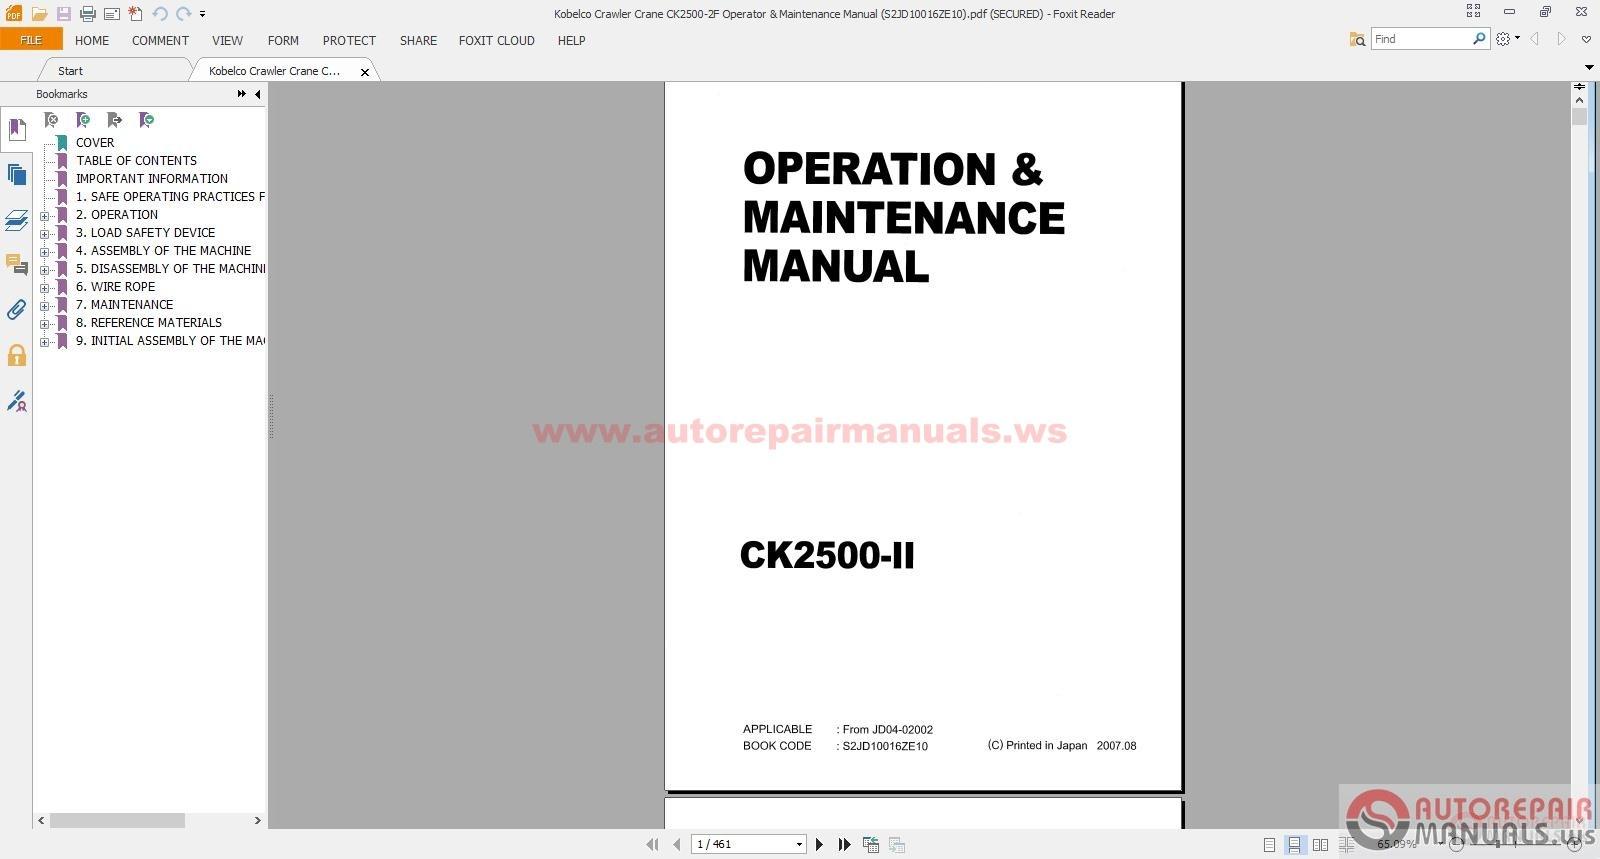 free auto repair manual kobelco crane shop manual. Black Bedroom Furniture Sets. Home Design Ideas